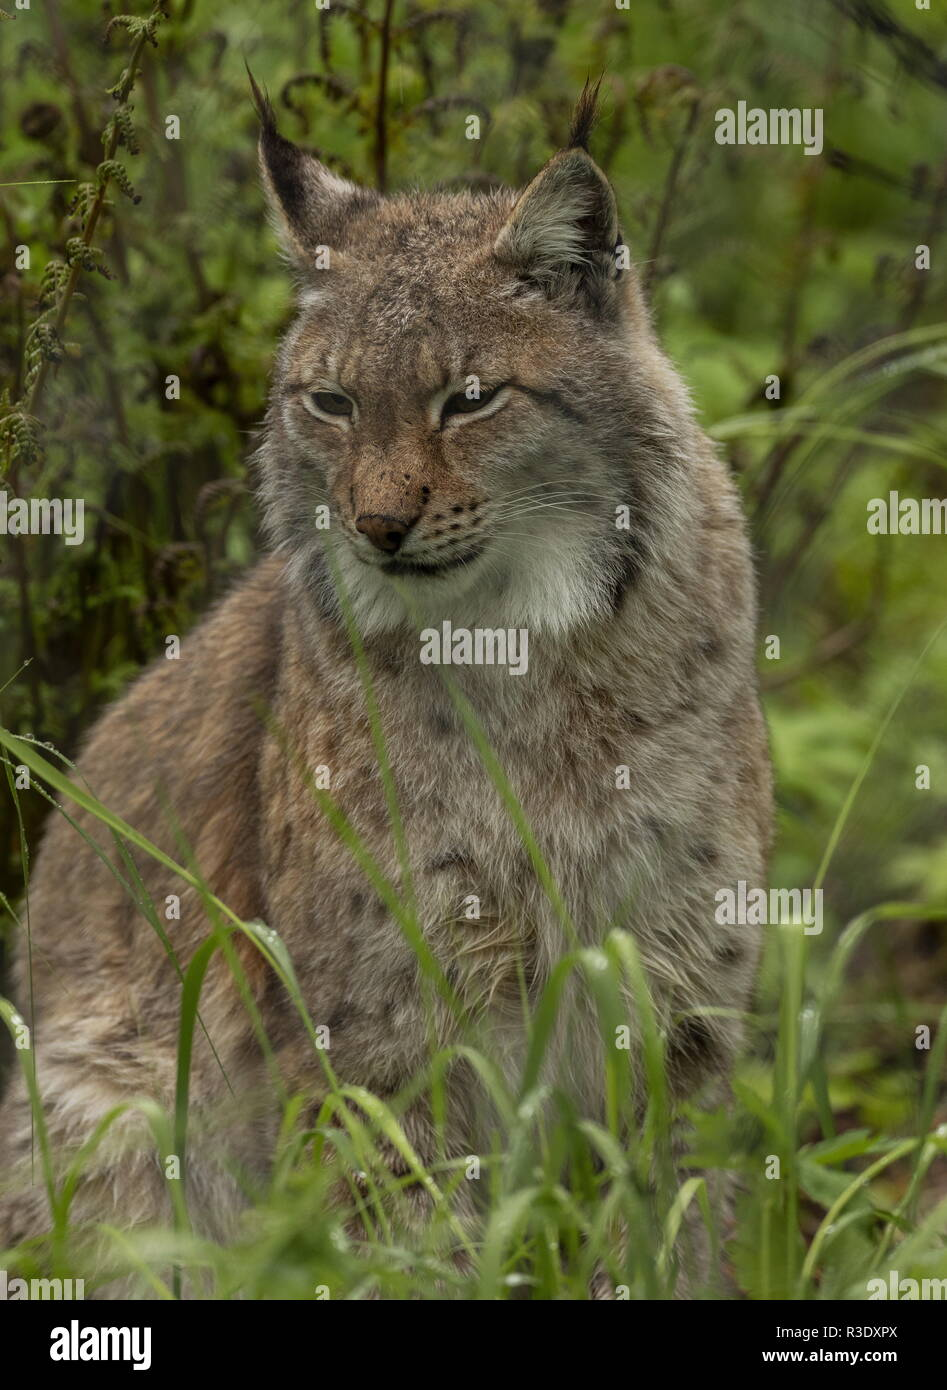 Eurasian lynx, Lynx lynx, in boreal woodland, Scandinavia. - Stock Image